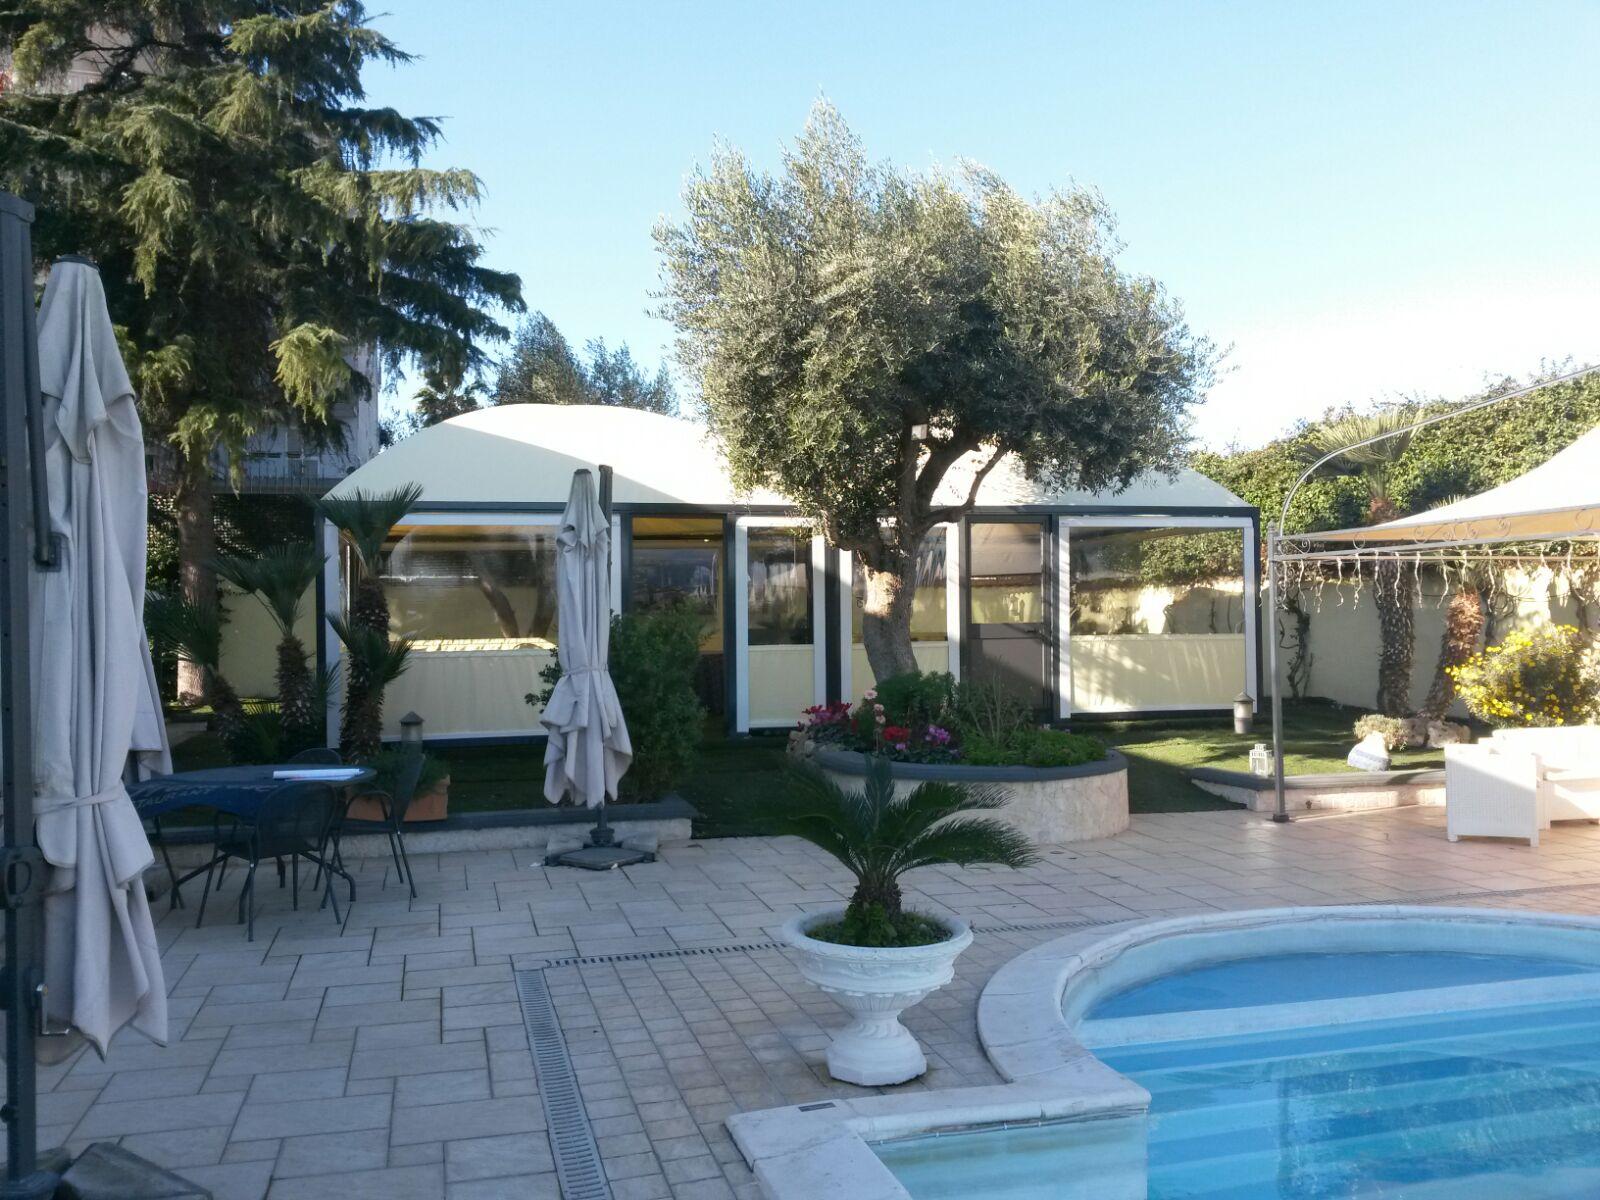 gazebo temporaneo per giardino con piscina